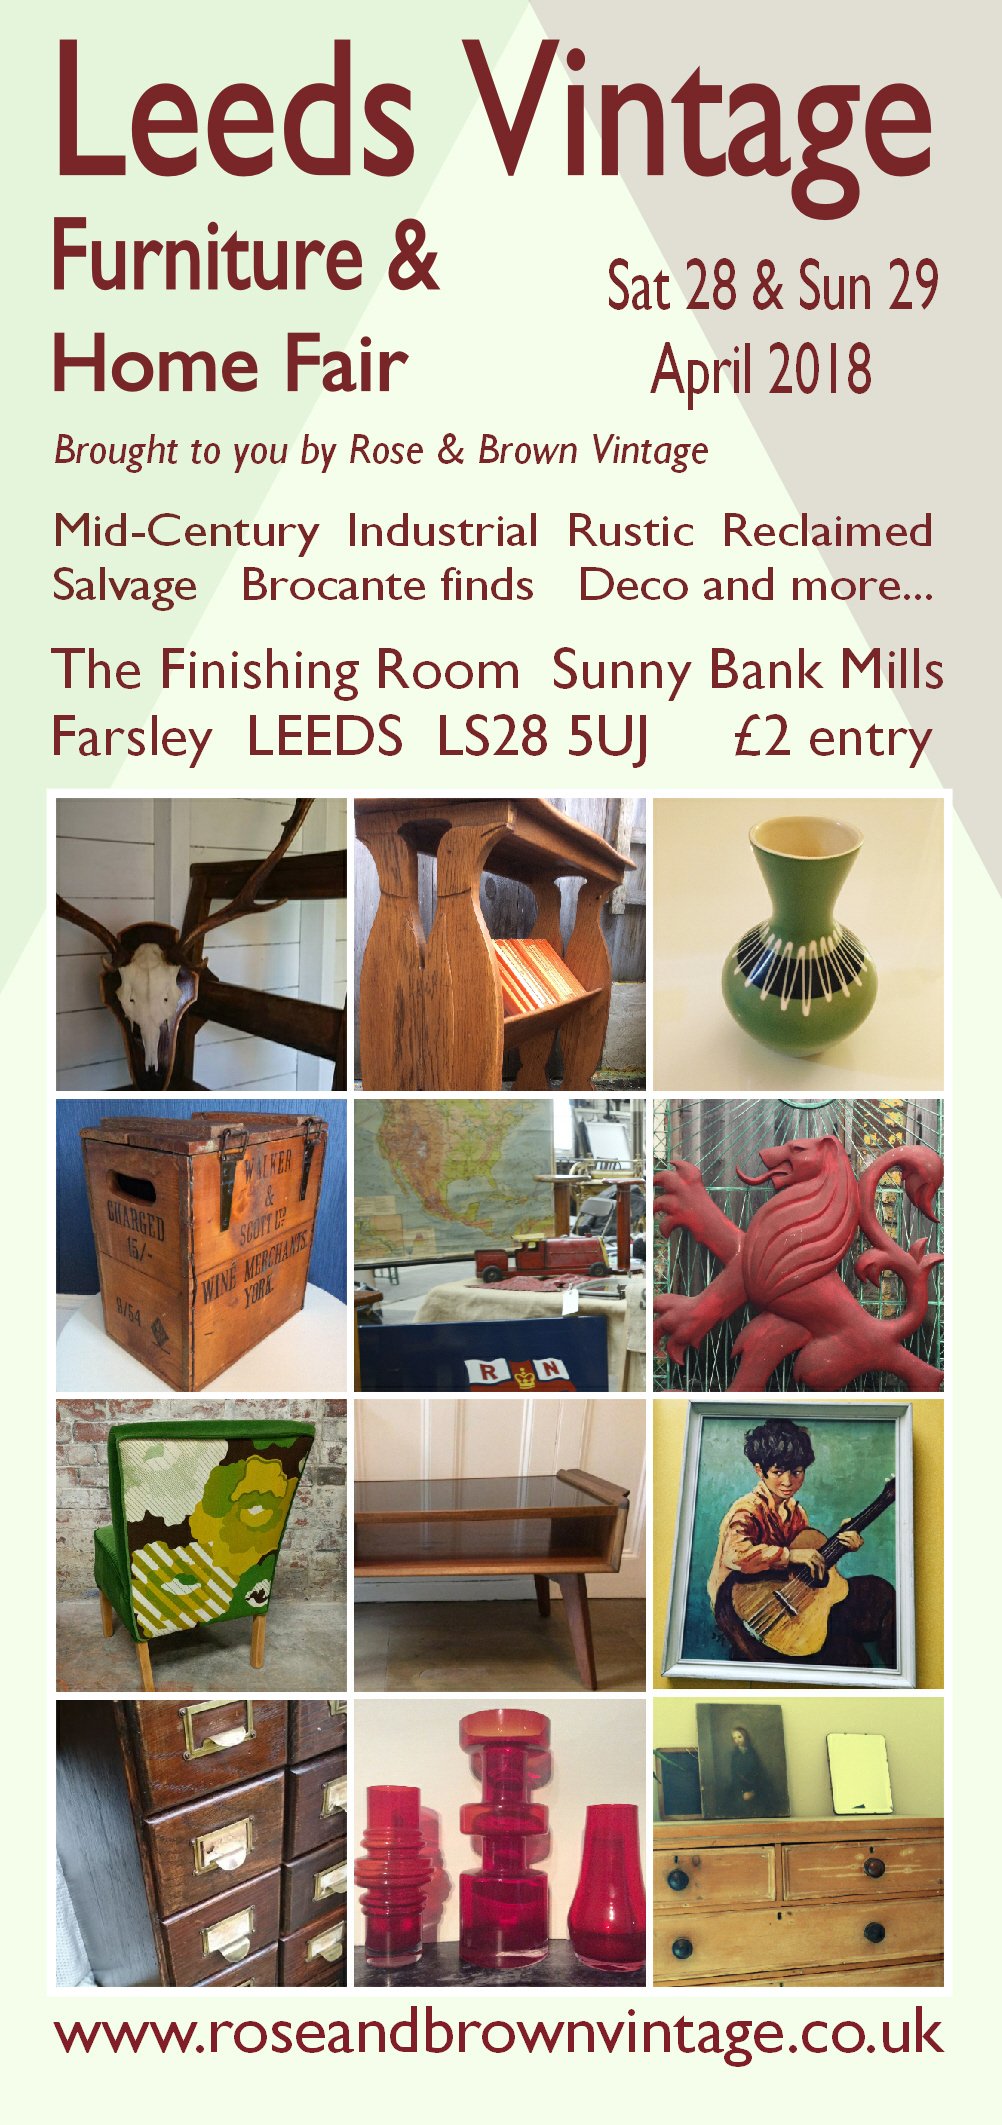 House of rose brown vintage boutique vintage clothing uk39 for Home furniture fair 17